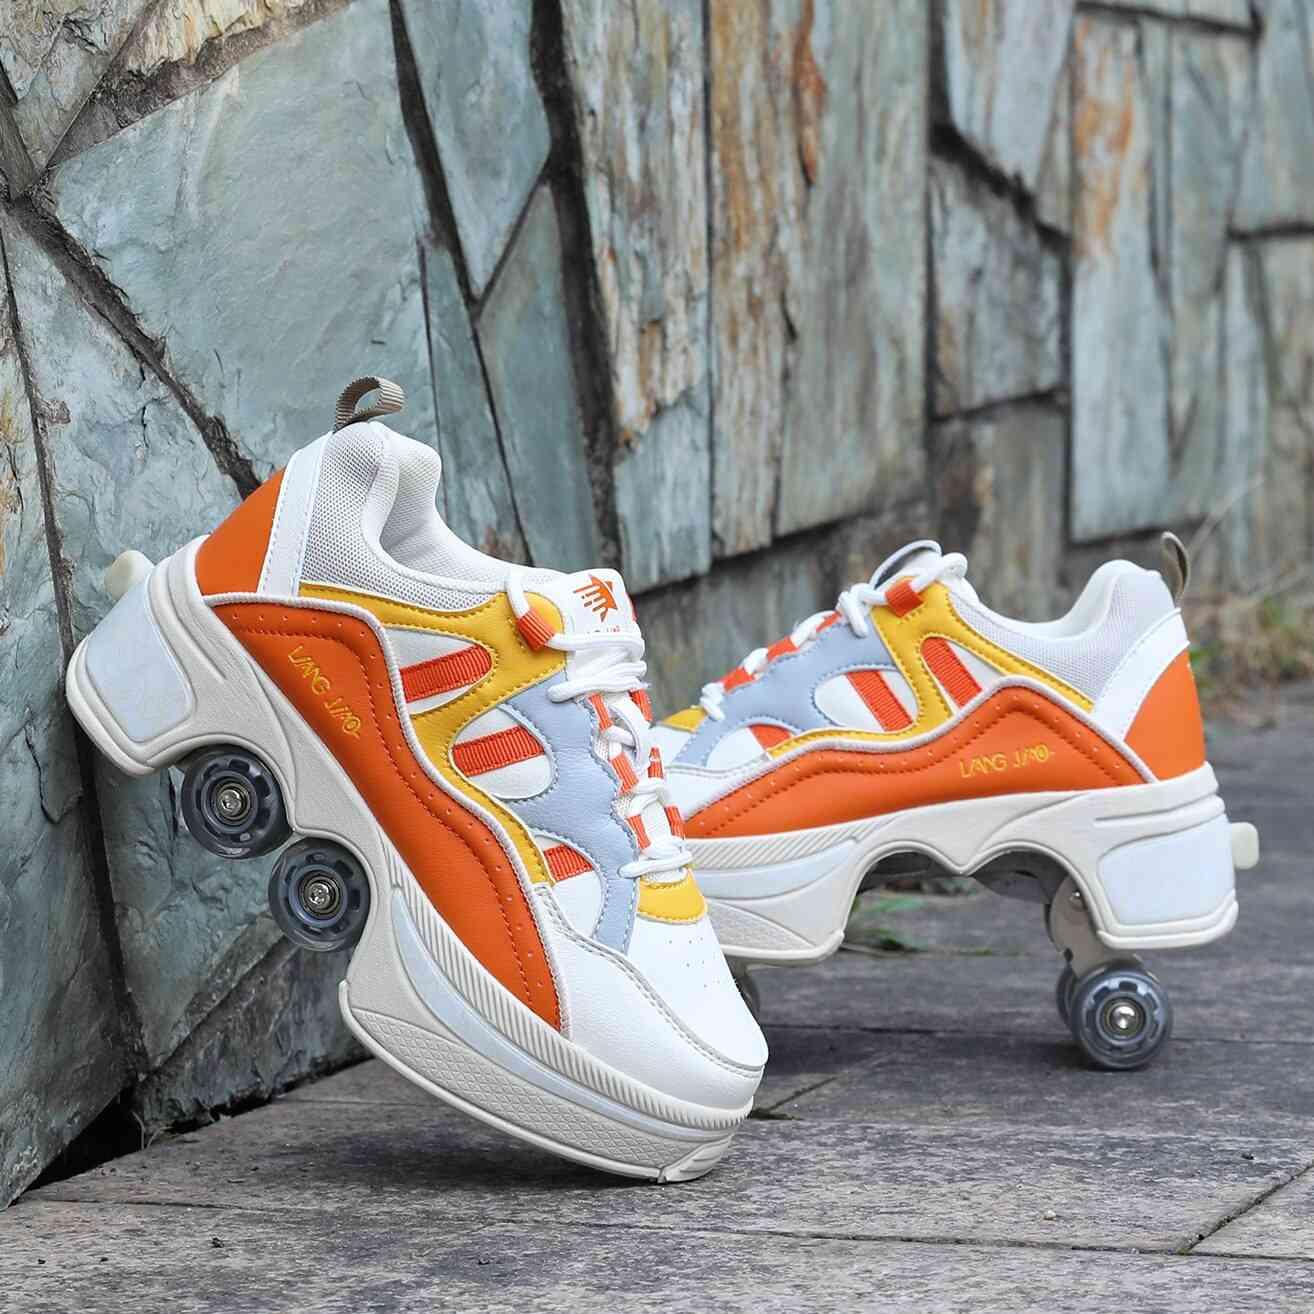 Leather 4 Wheels Double Line Roller Skates Shoes - Orange